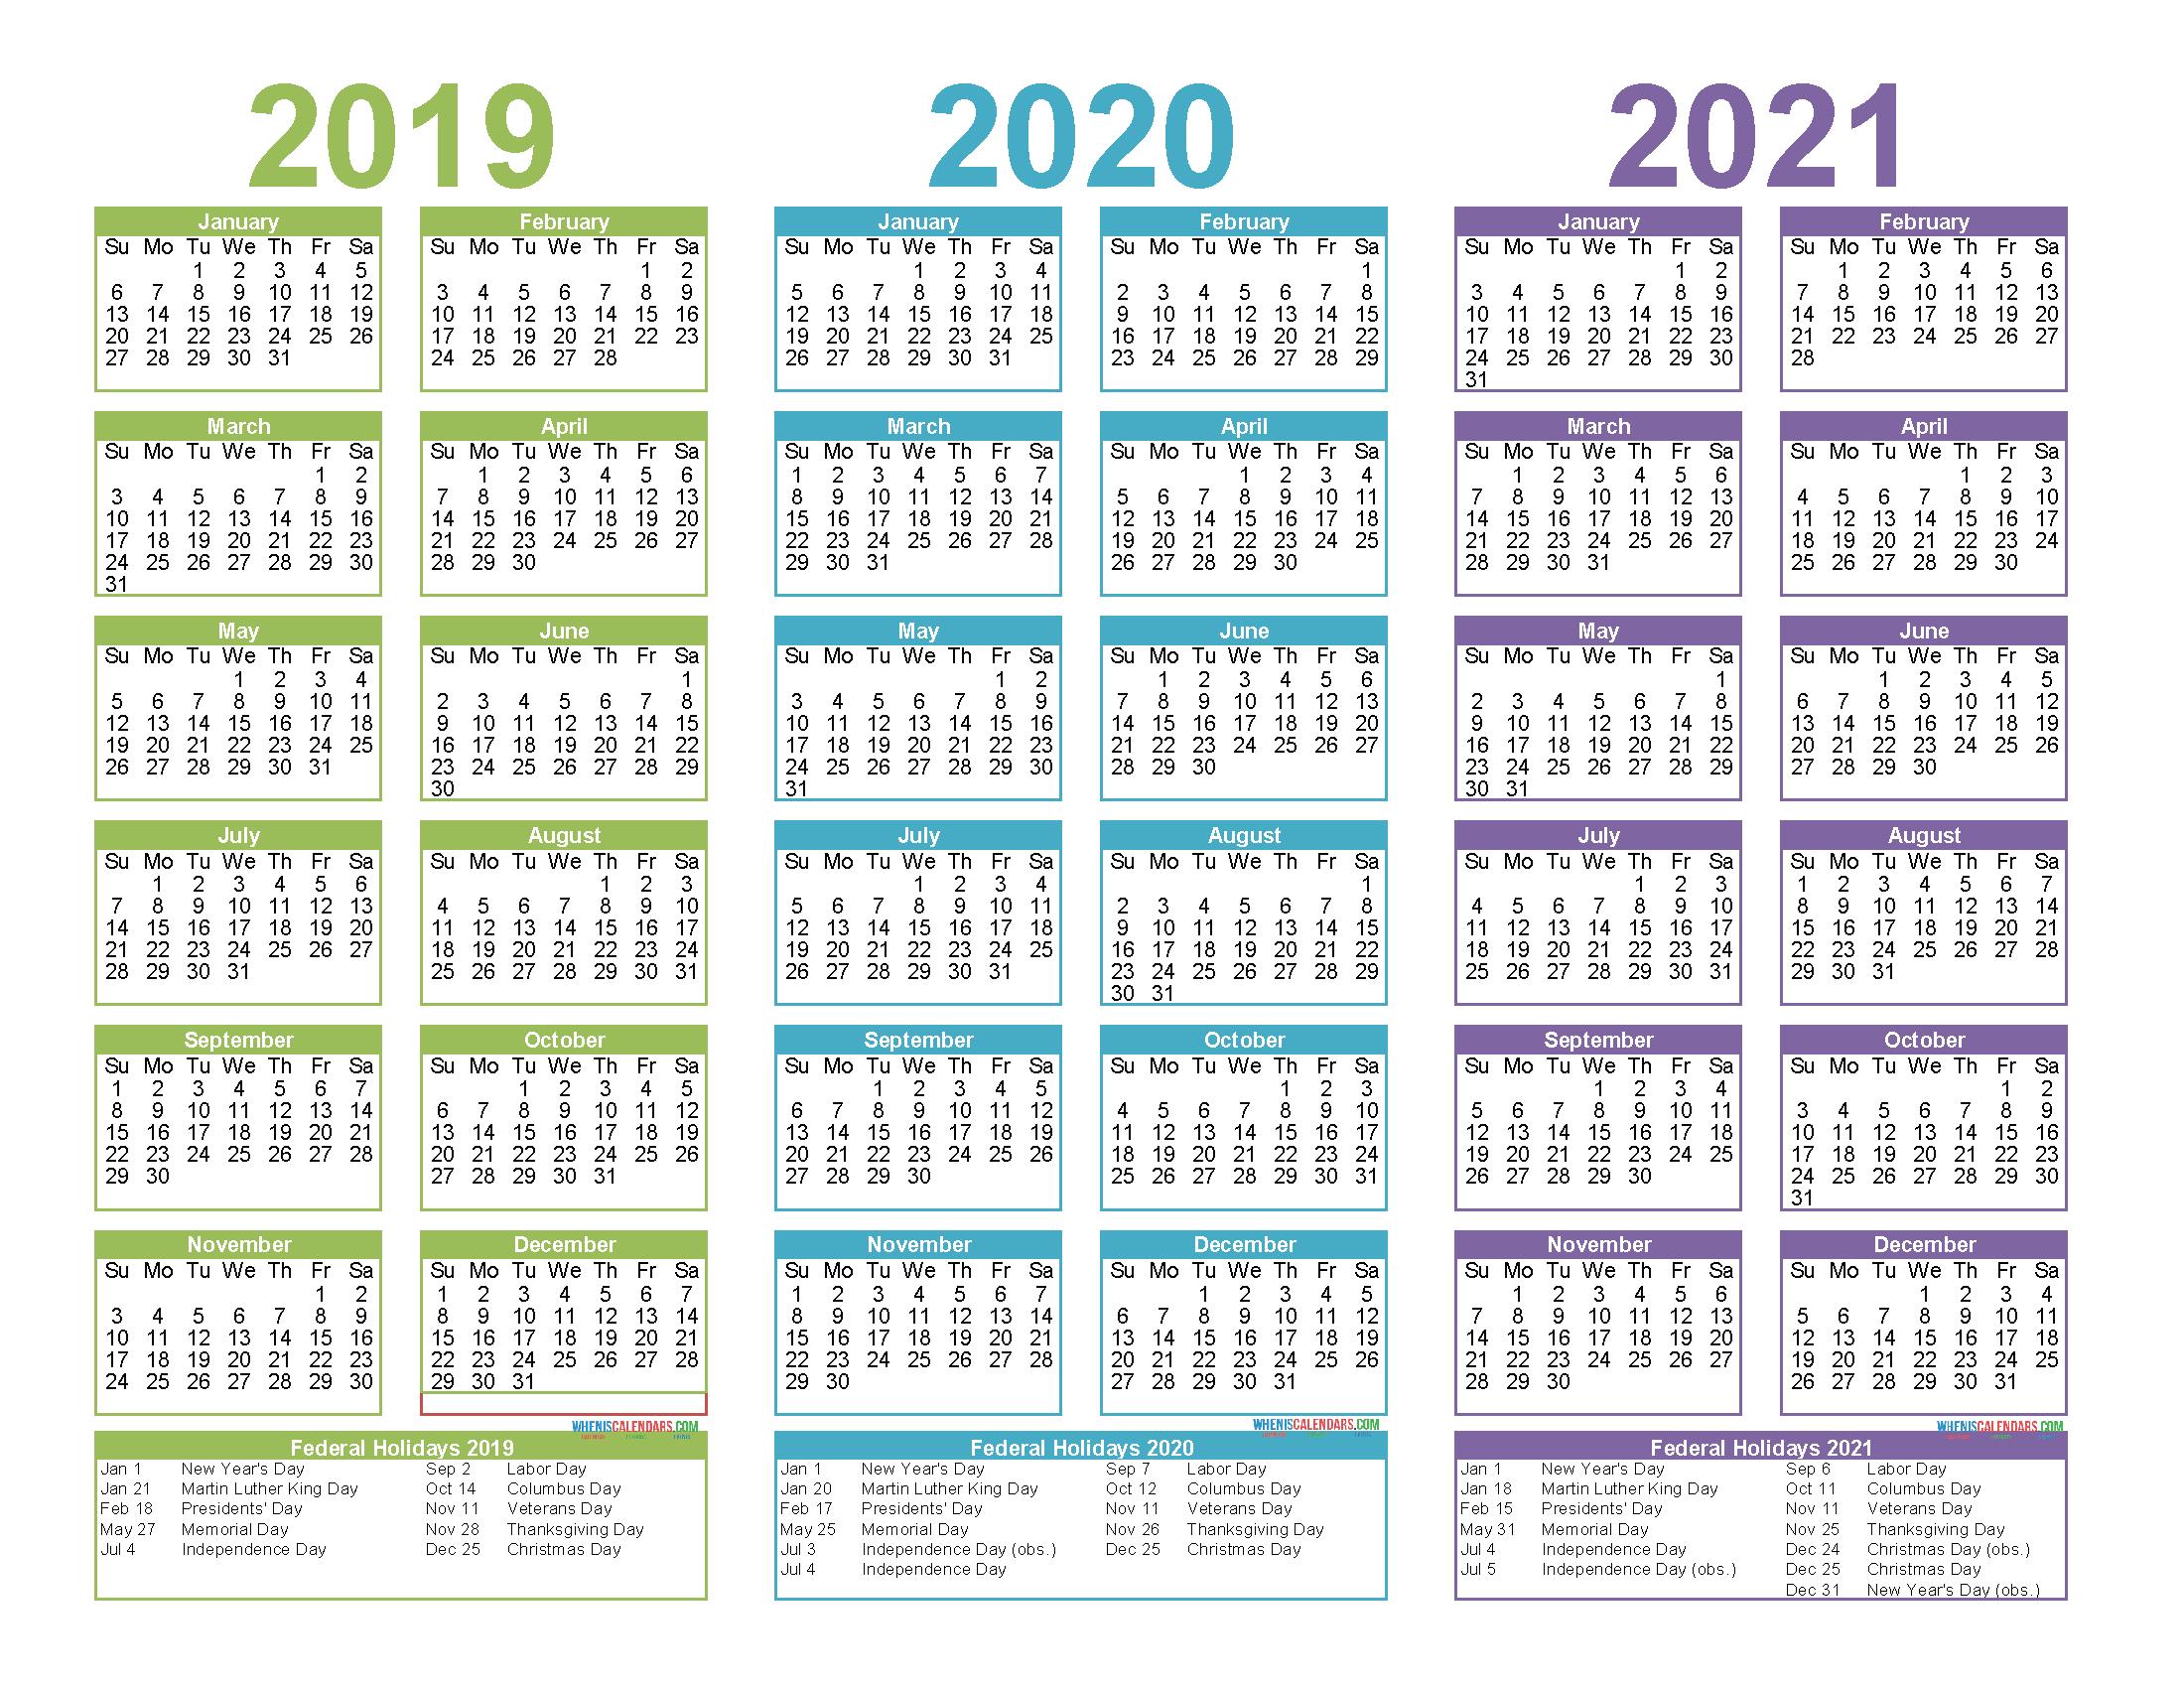 2019 To 2021 3 Year Calendar Printable Free Pdf, Word, Image in 3 Year Calendar 2020